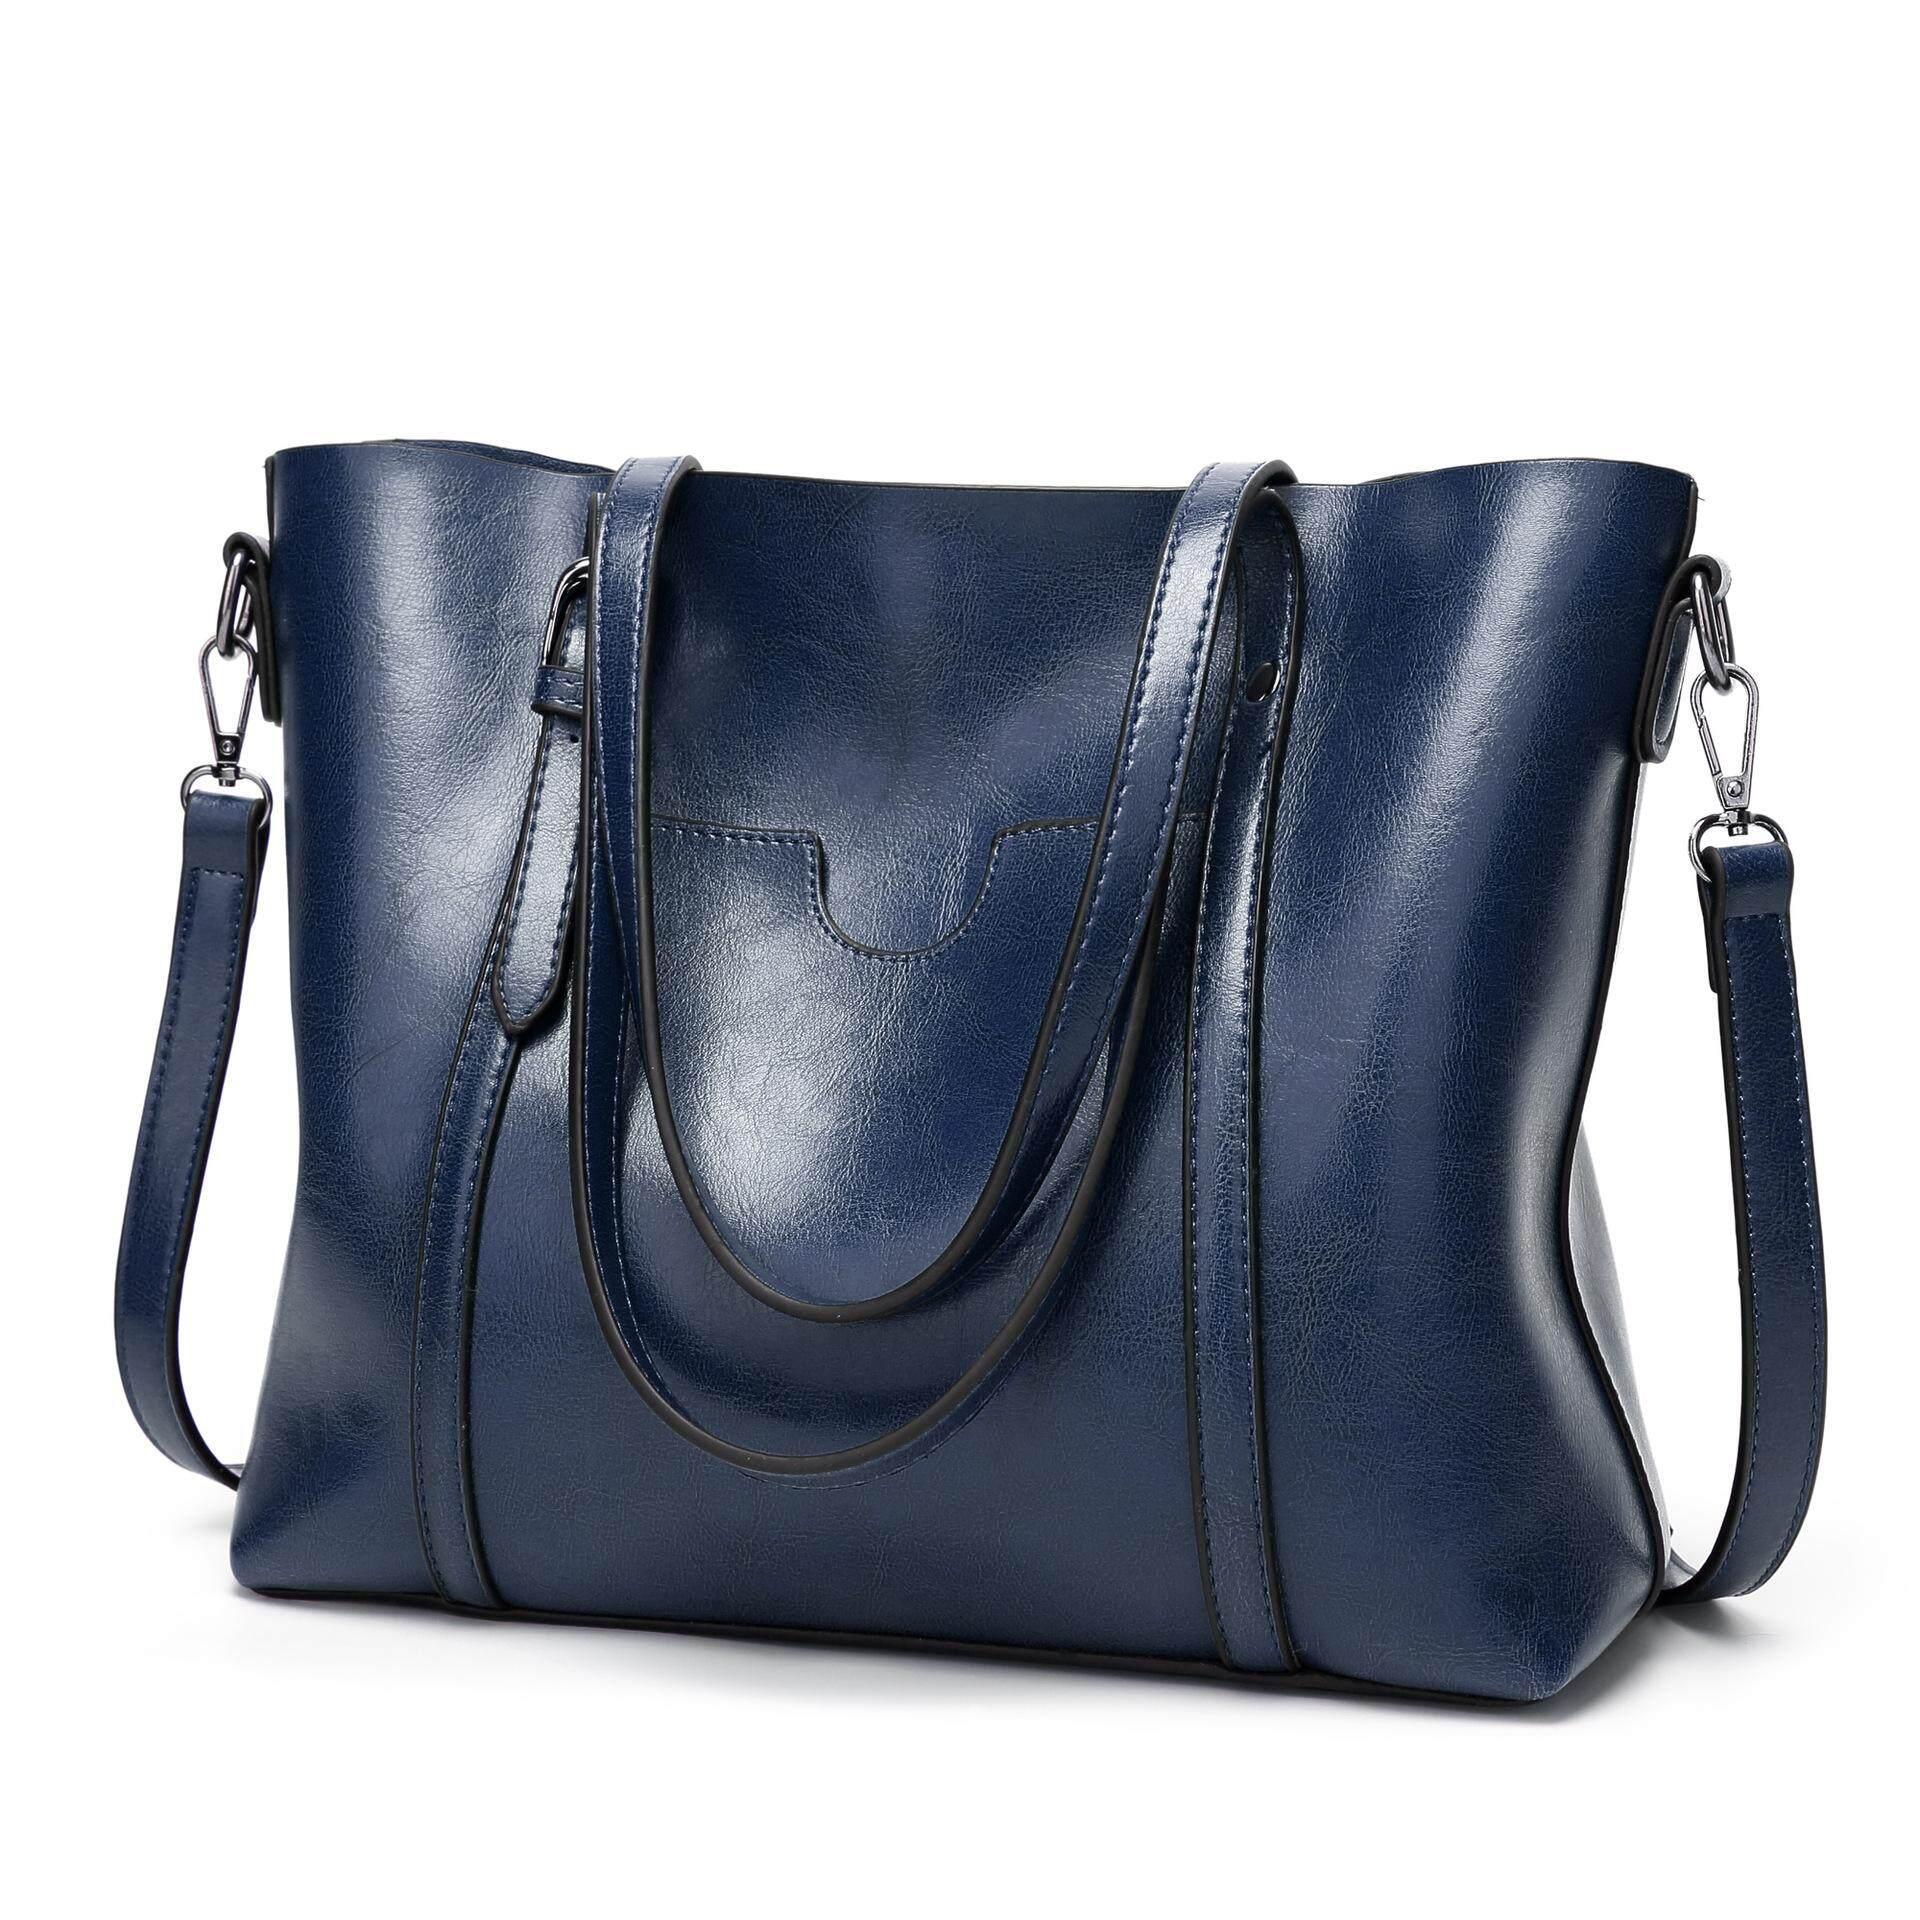 946c66fd7997 New Fashion Messenger Bag Women s Handbags Europe and America shoulder bag  Tote bag